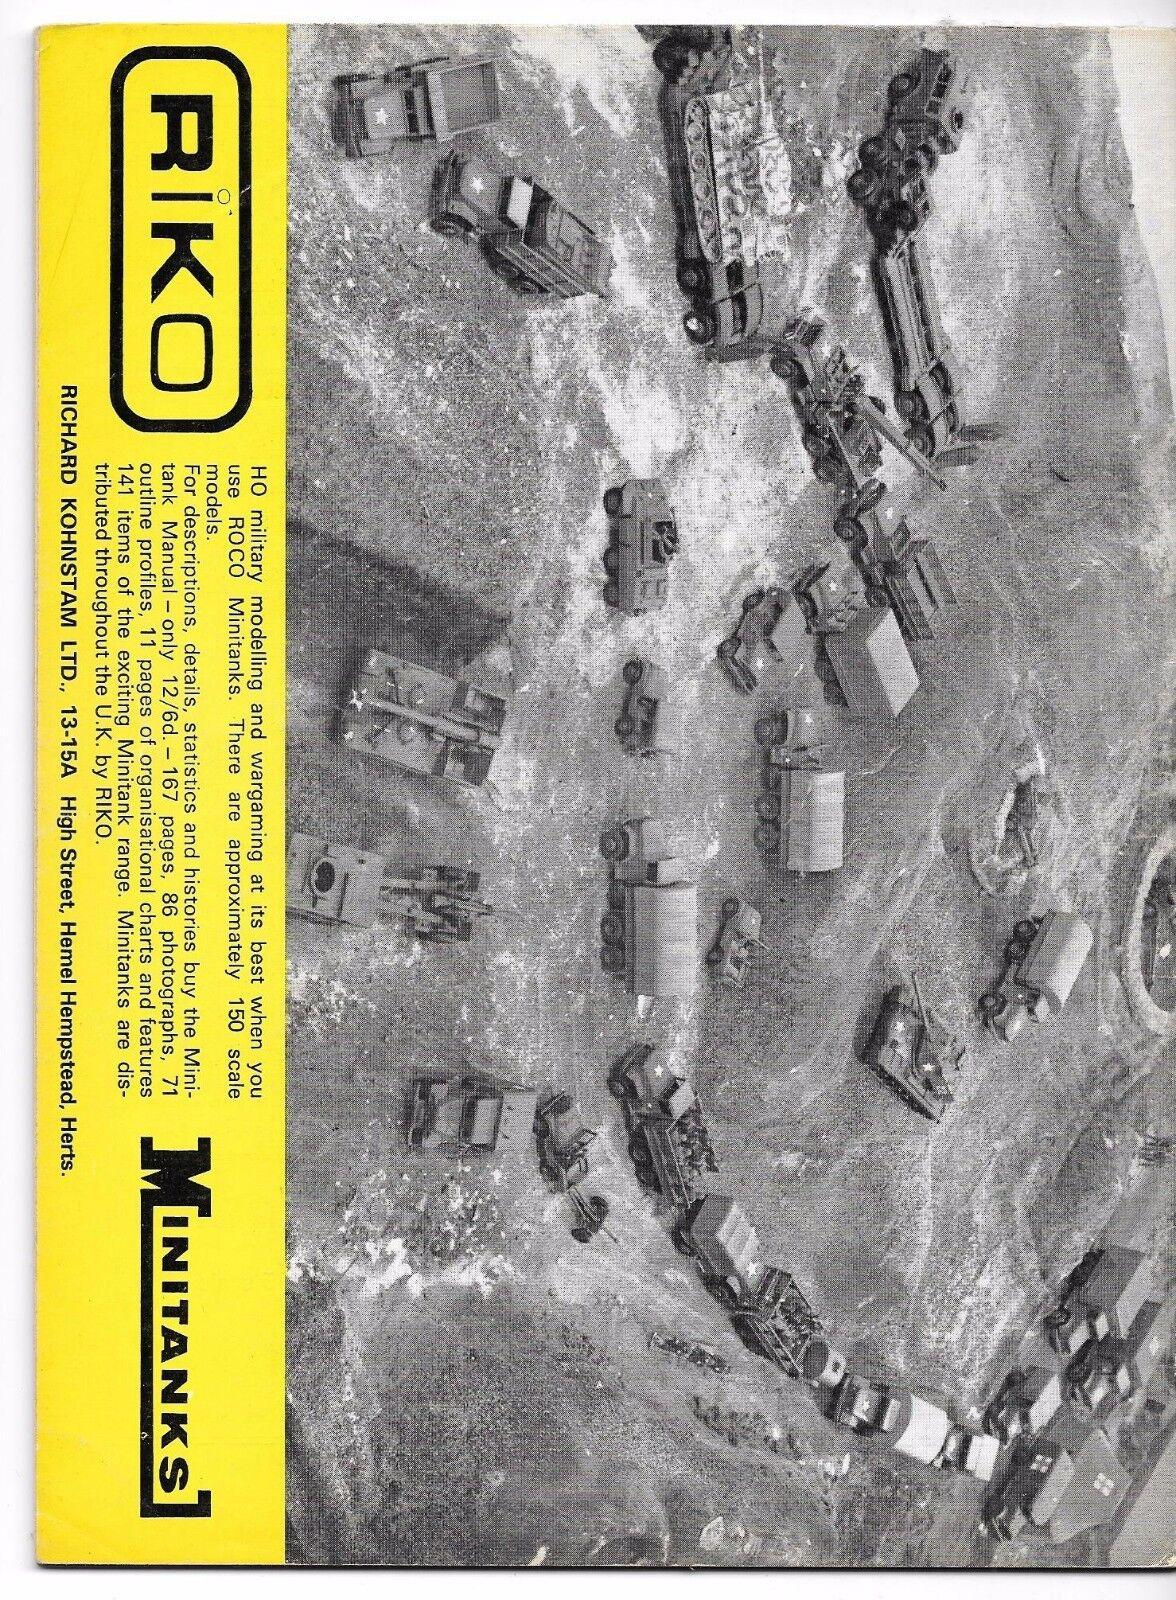 Military Modelling Modelling Modelling Ejemplar No.1 ,Primero Ejemplar, Raro, Jan 1971 In Fine 7e7782